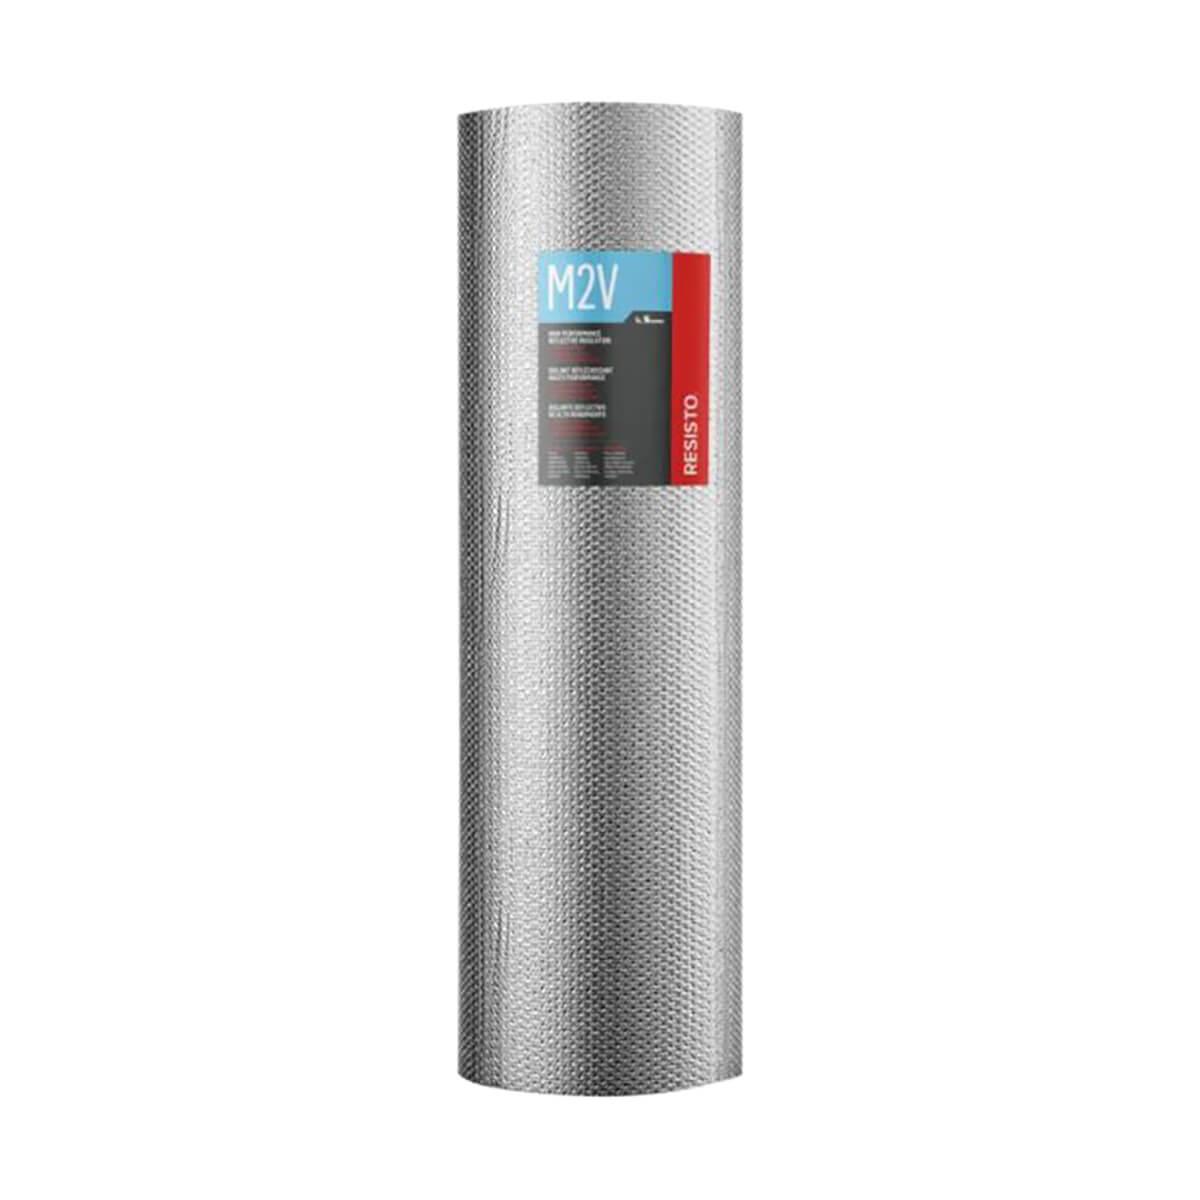 "Ayr-foil Reflective Insulation - 48"" X 125'"